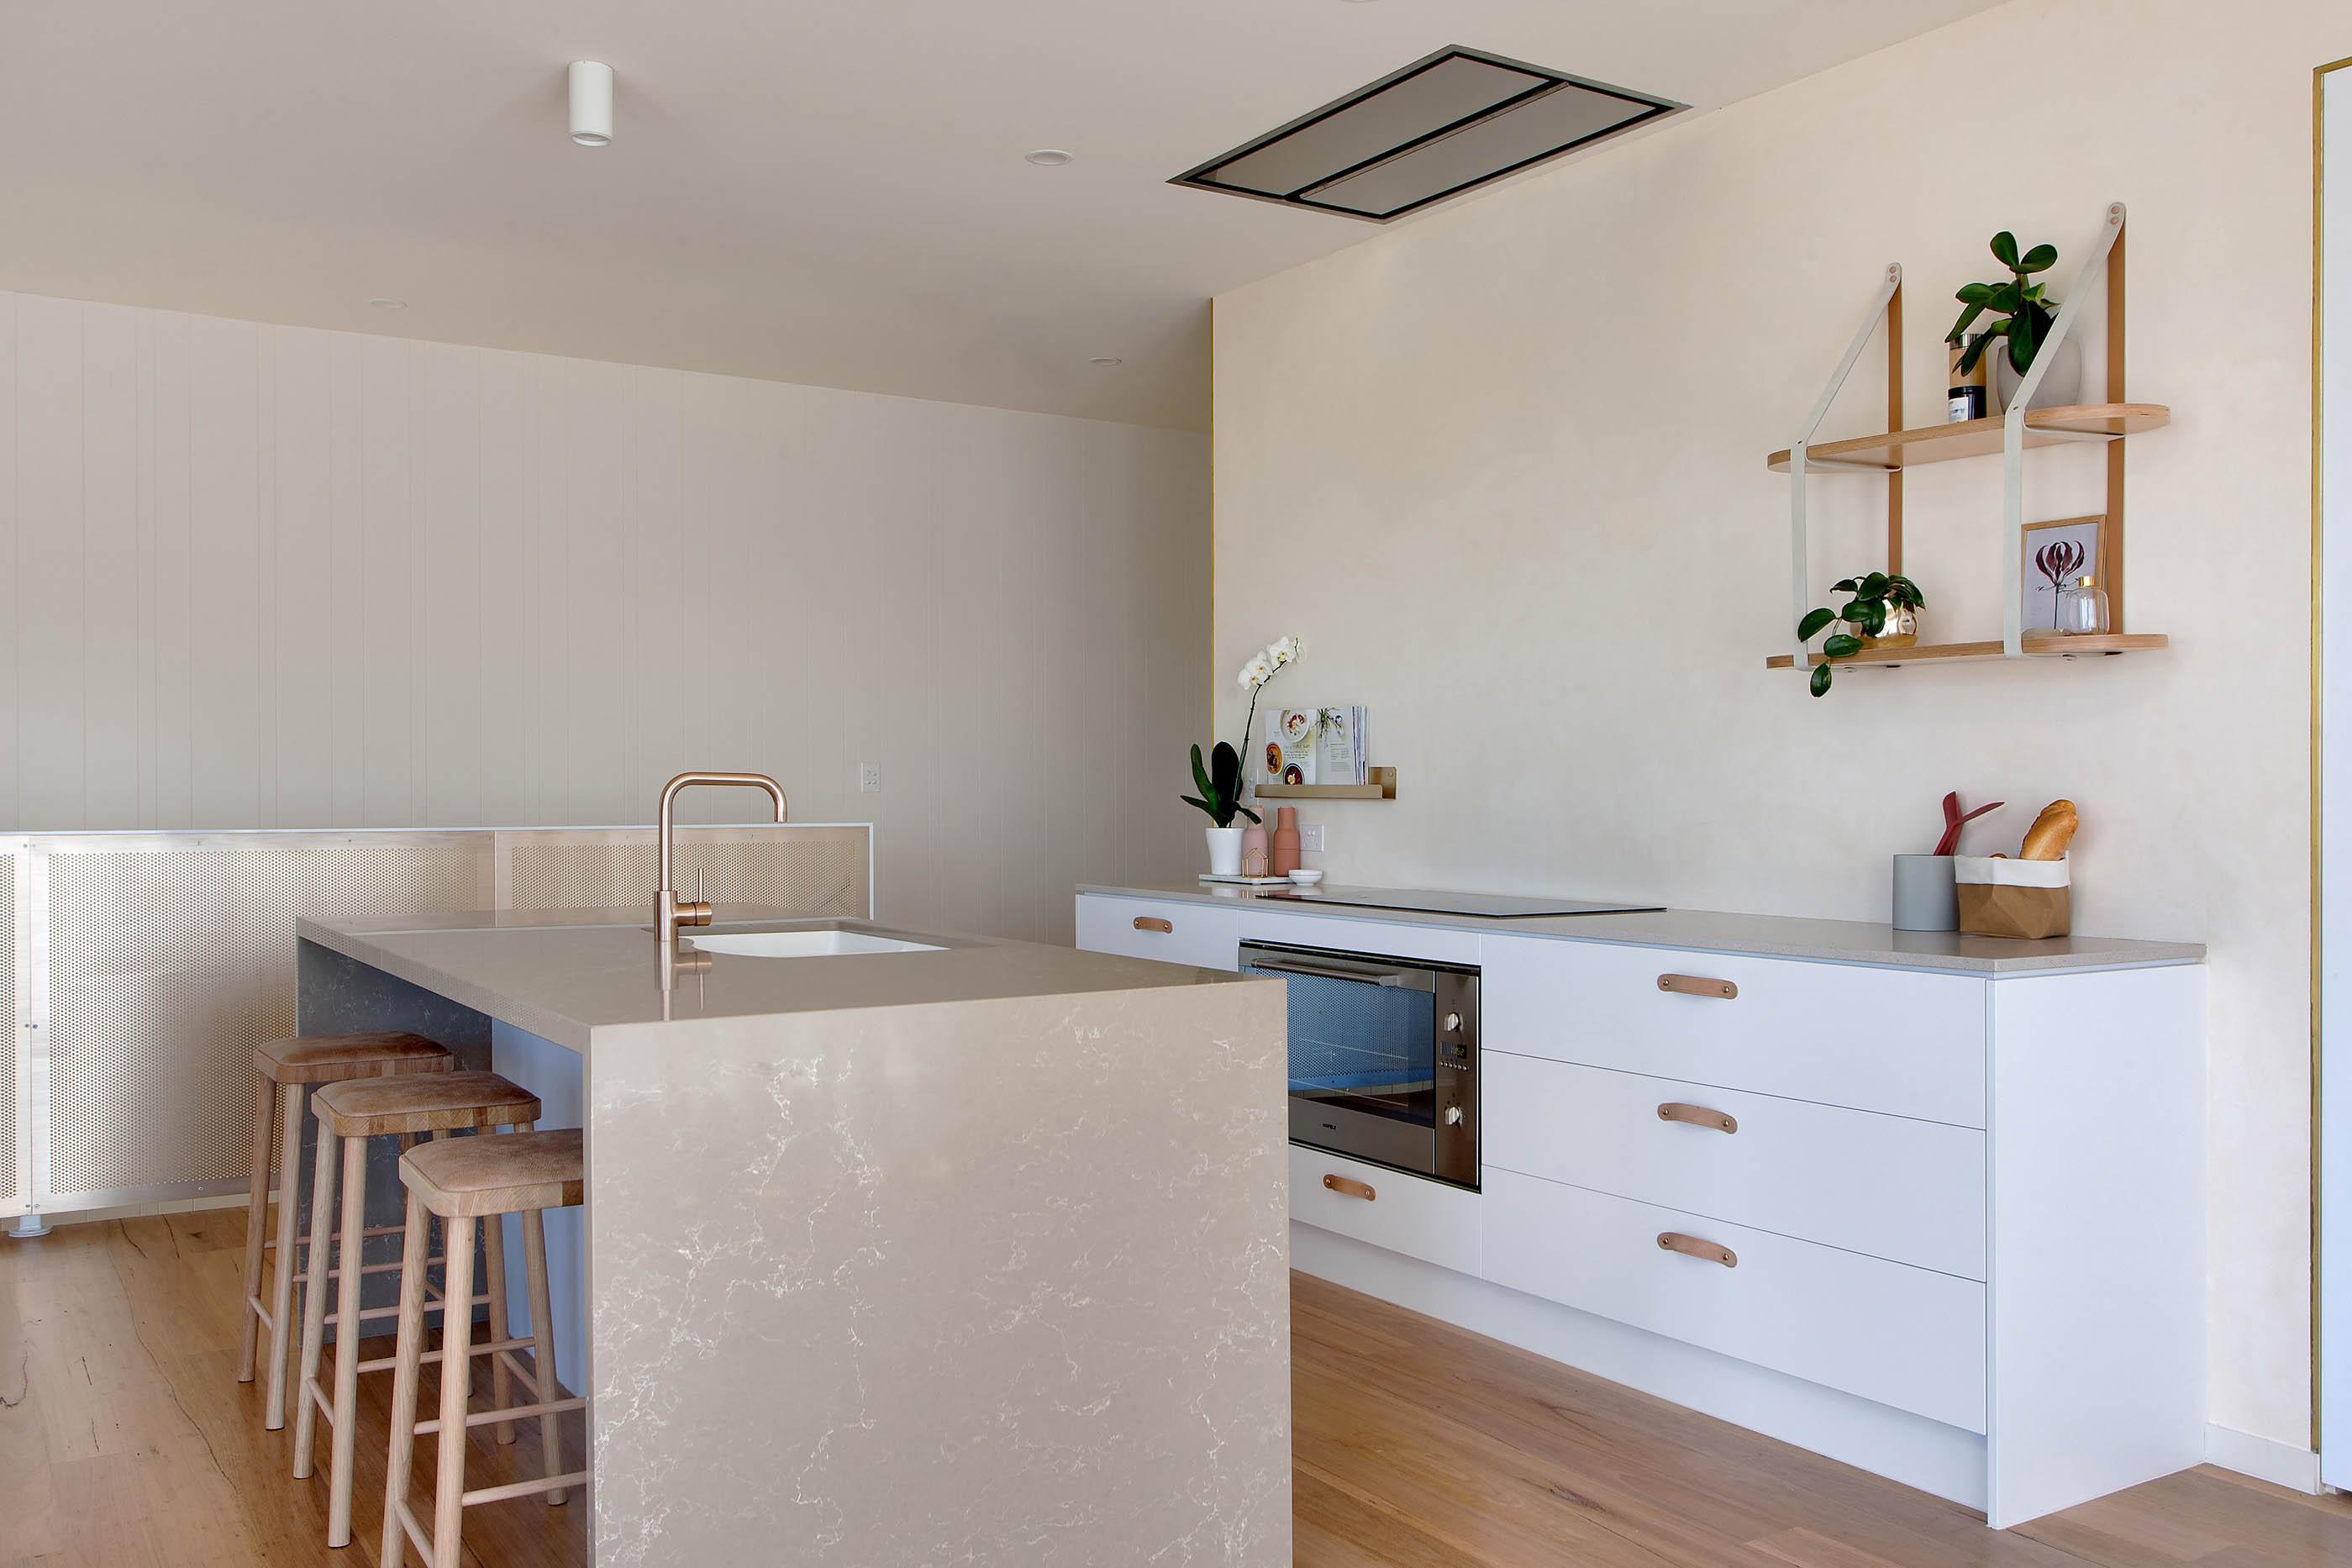 Minimalist Kitchen Design with Gold Features